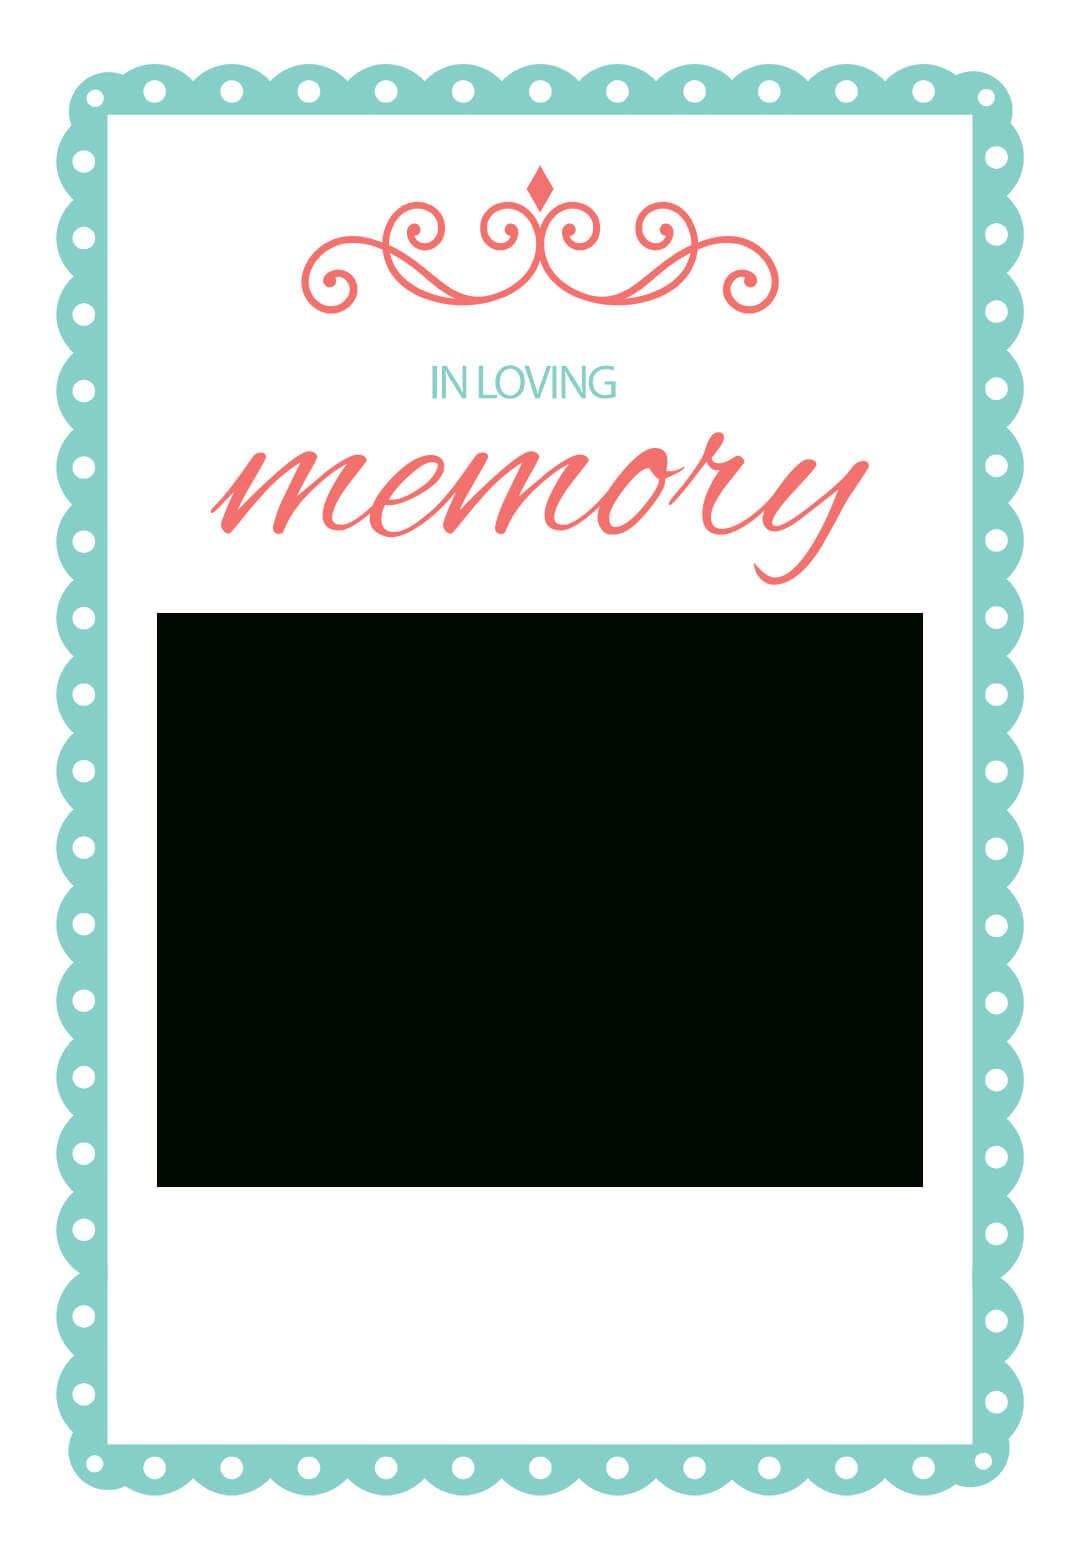 In Loving Memory - Free Memorial Card Template | Greetings Inside Remembrance Cards Template Free